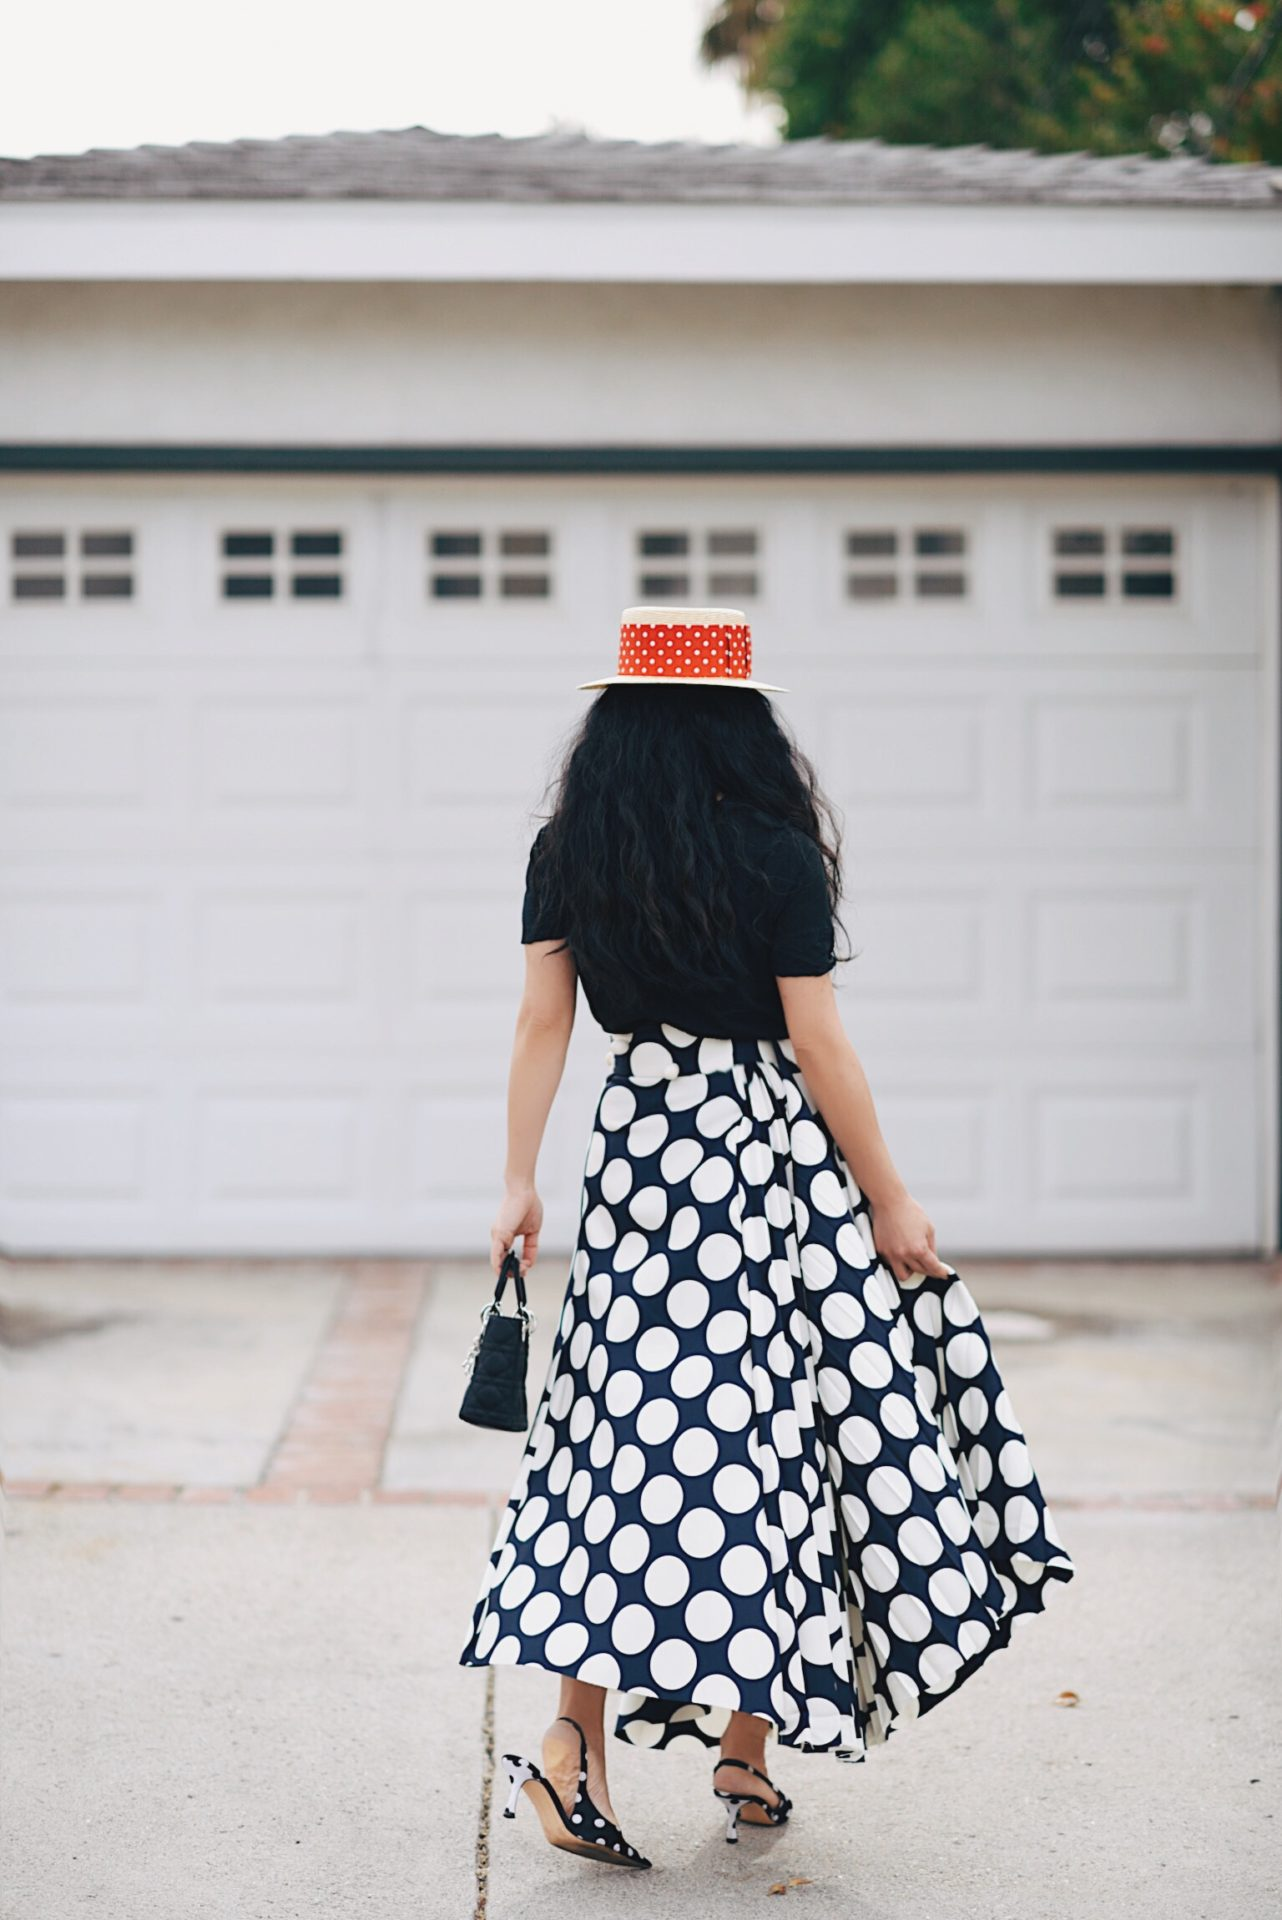 1df4b2e38fd69 Miu Miu Boater Hat   Polka Dot Midi Skirt – Hallie Daily